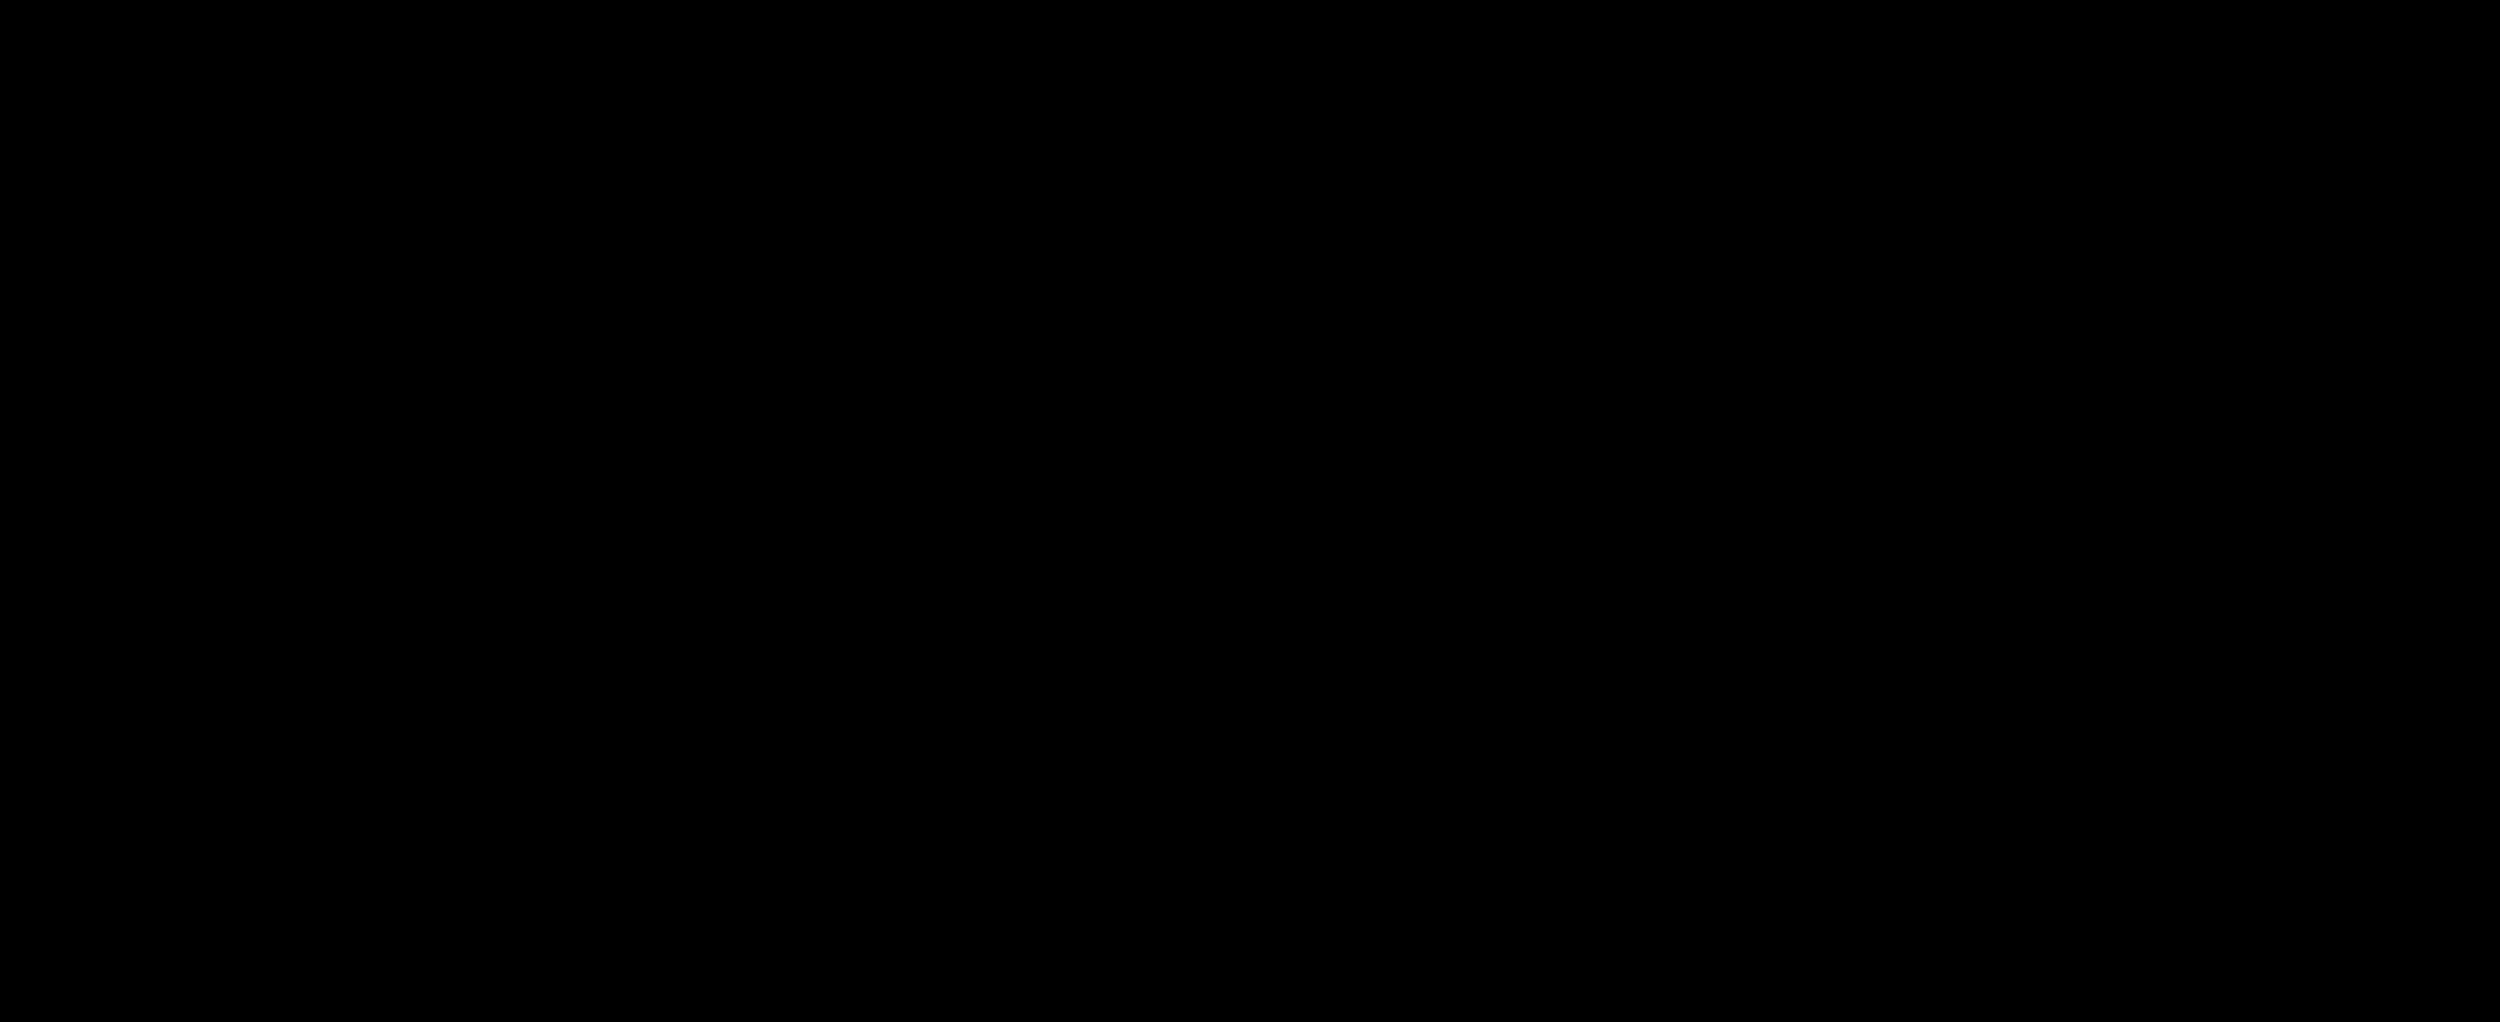 Thunder Logo Black Transparent.png